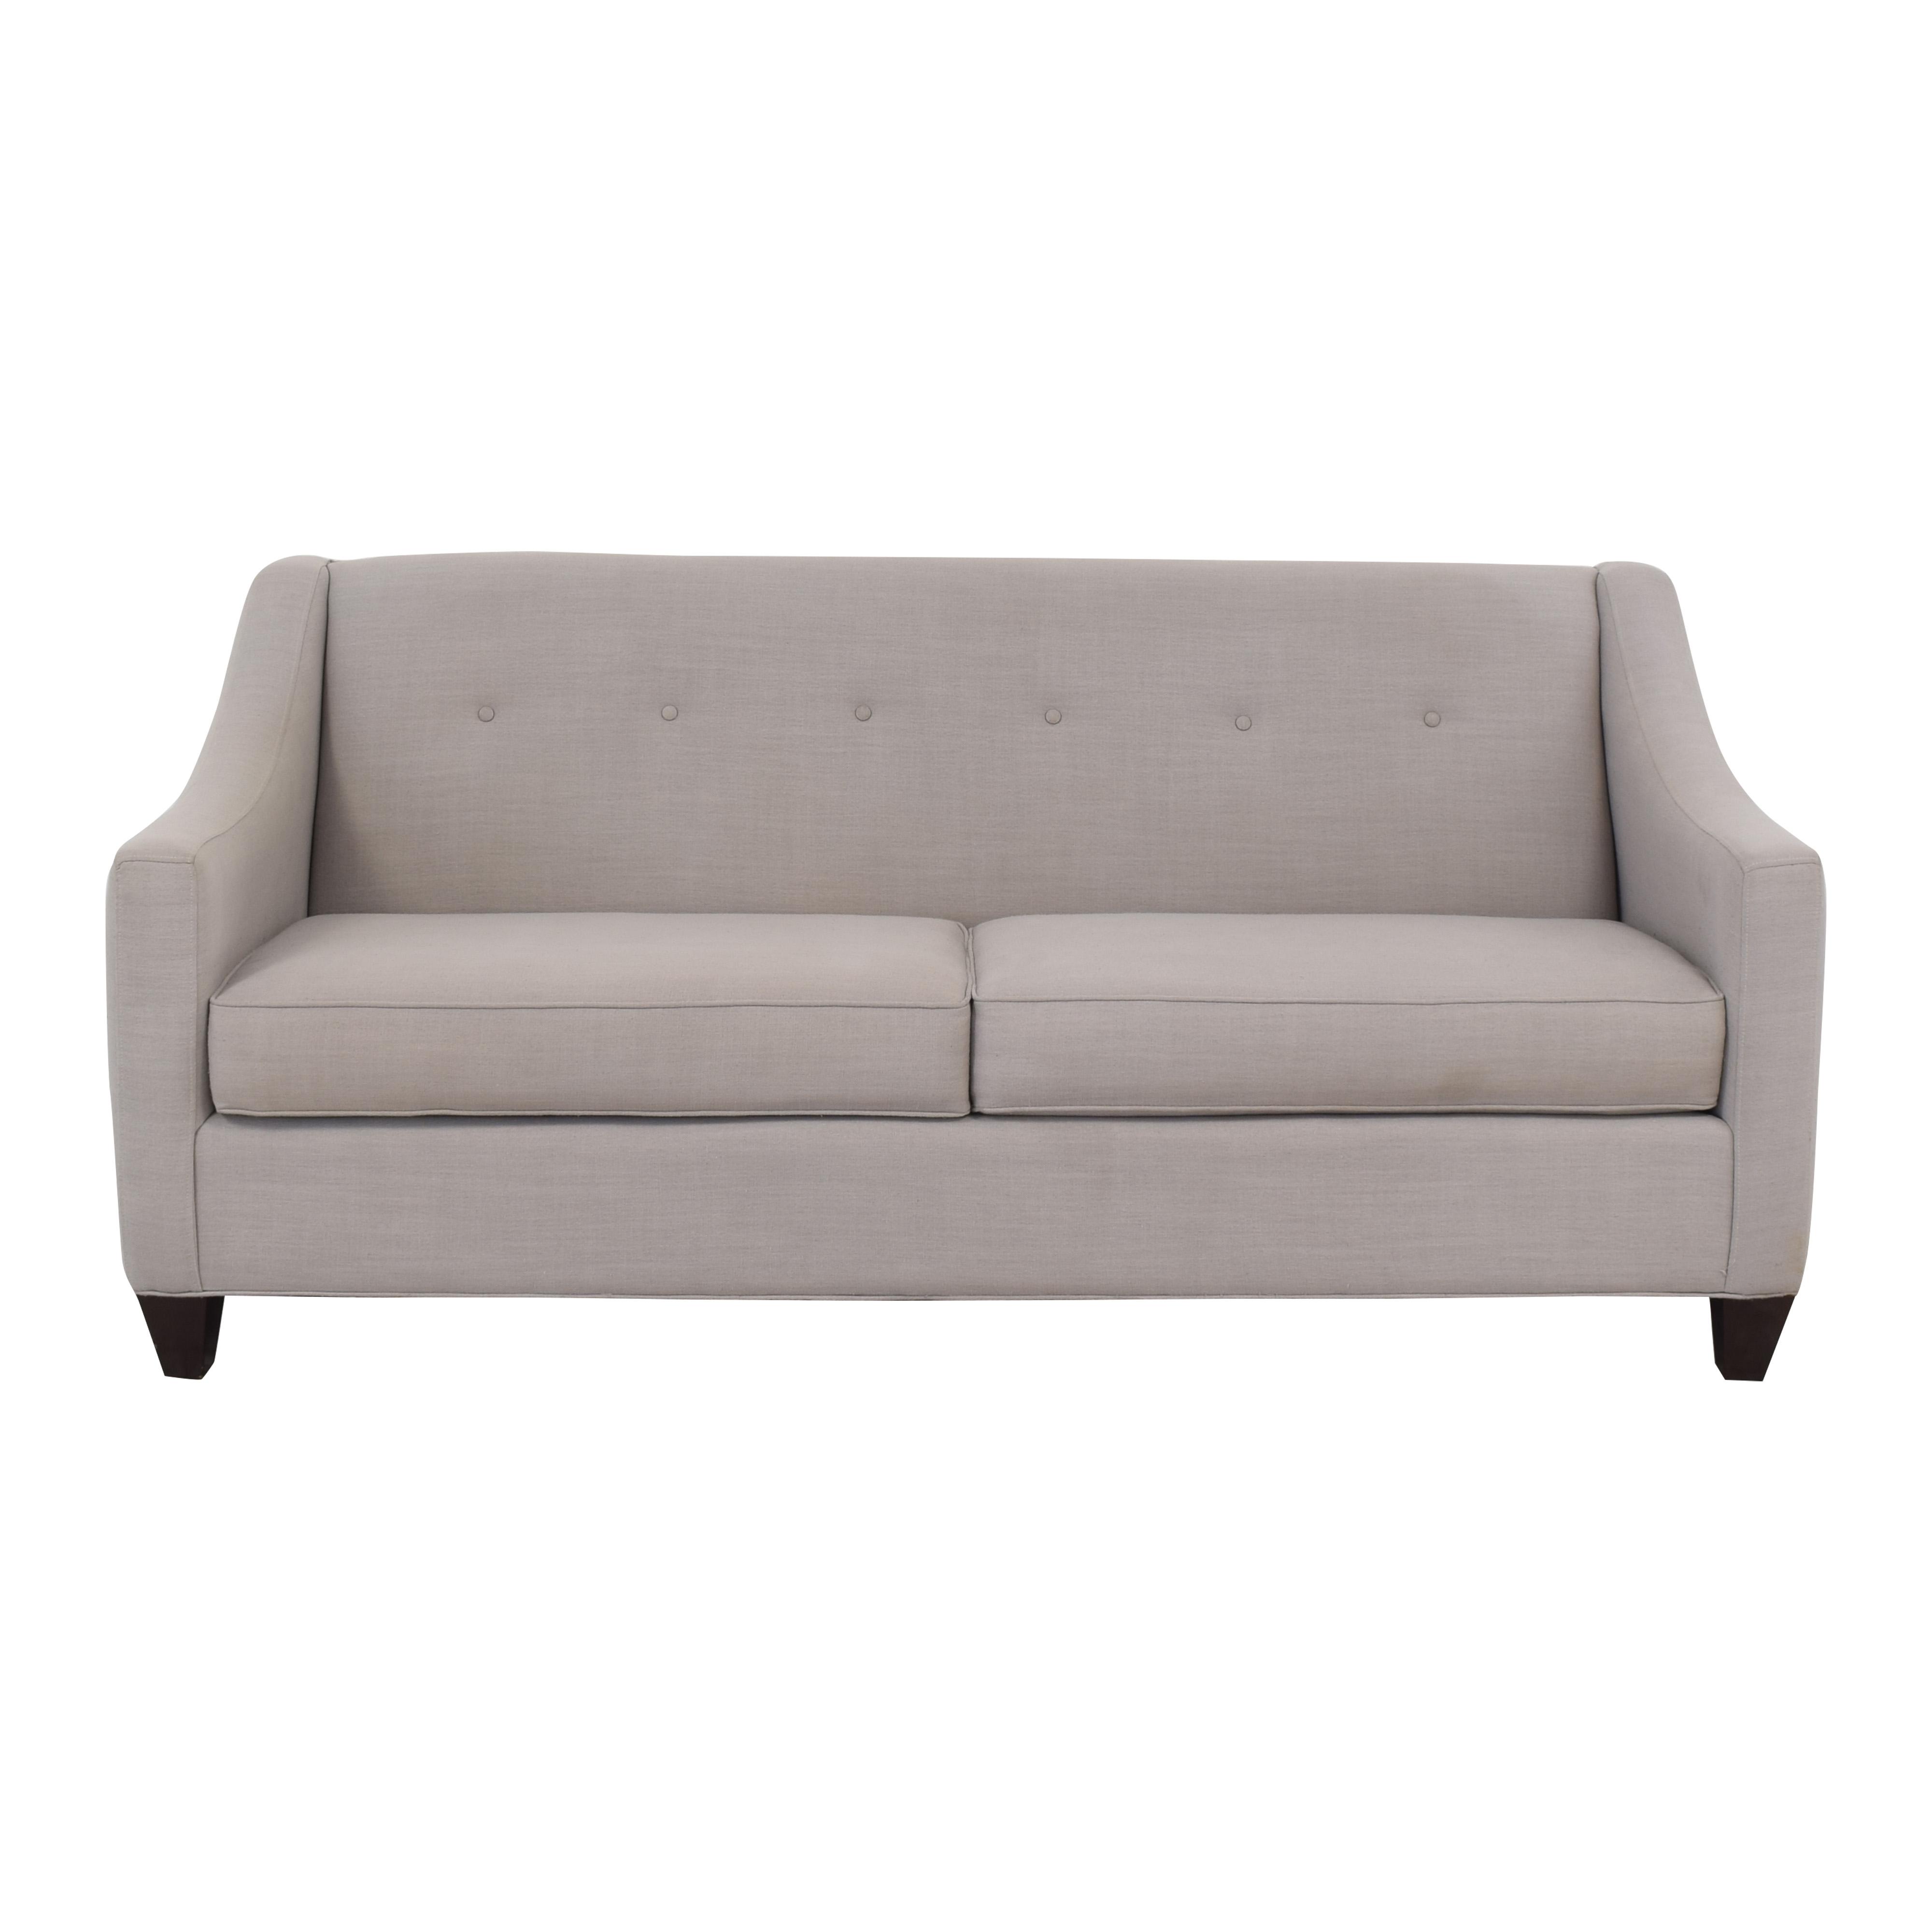 Craftmaster Furniture Craftmaster Grey Sofa nj